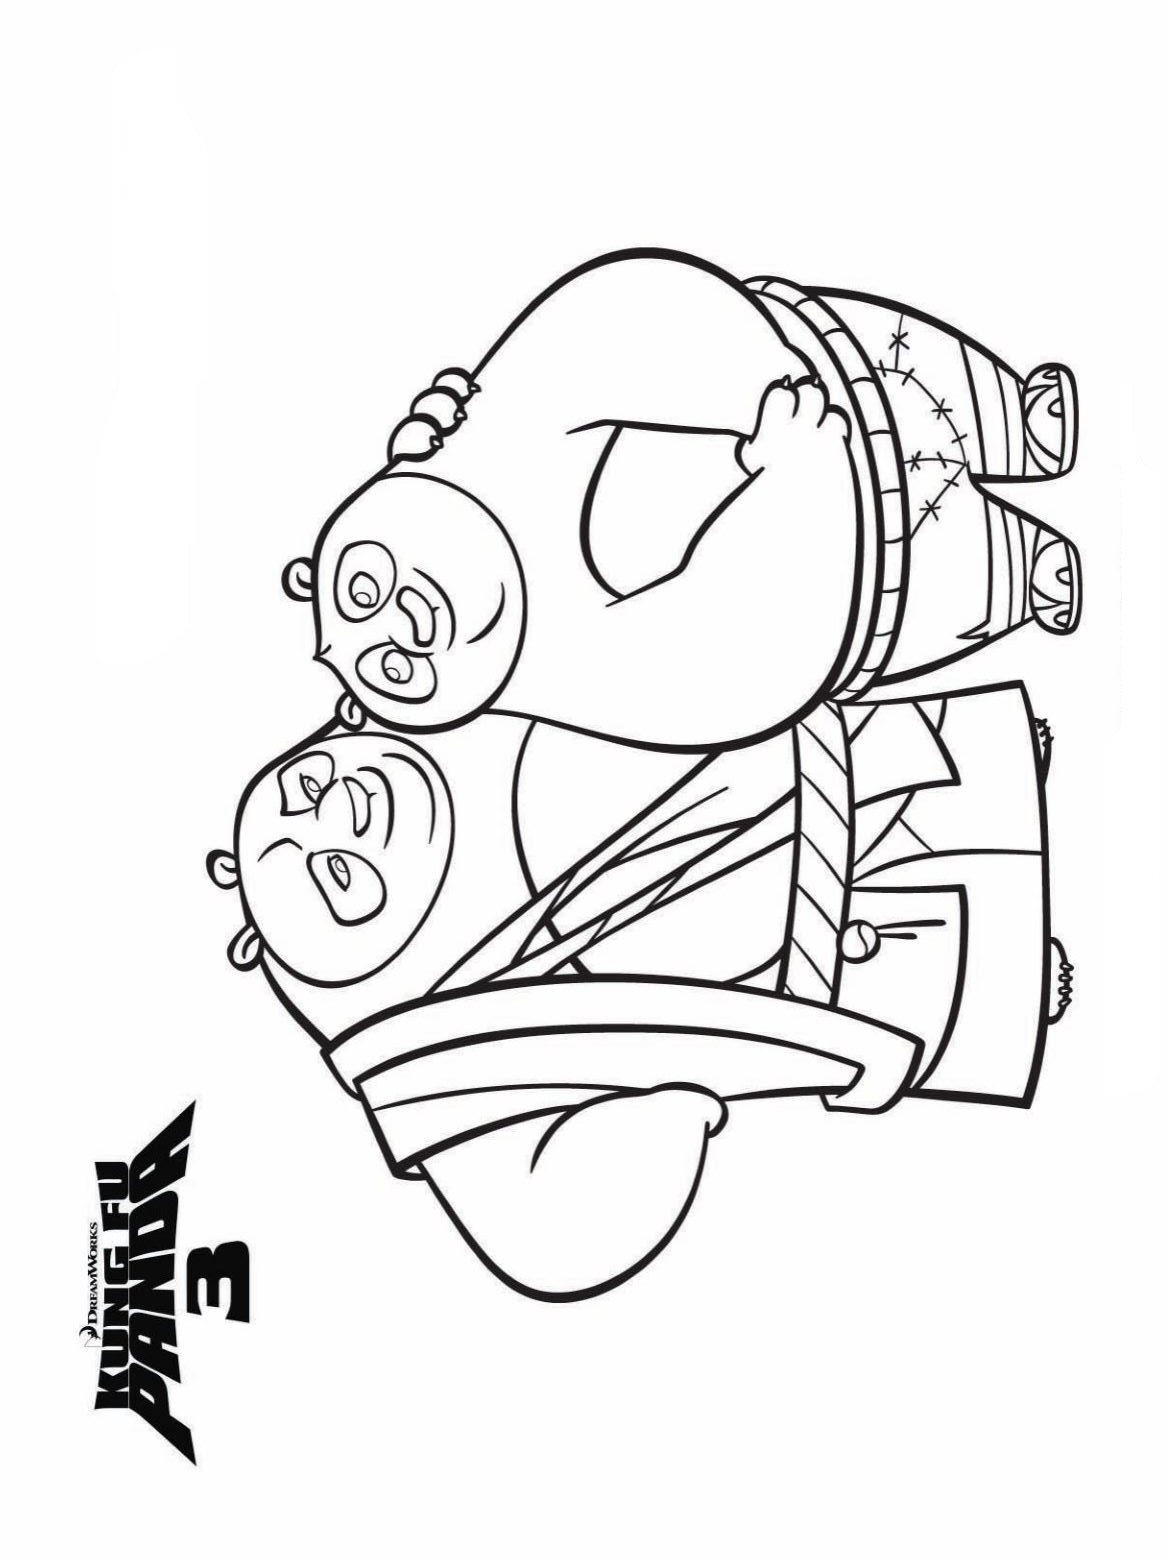 Kung Fu Panda 3 Free Coloring Pages